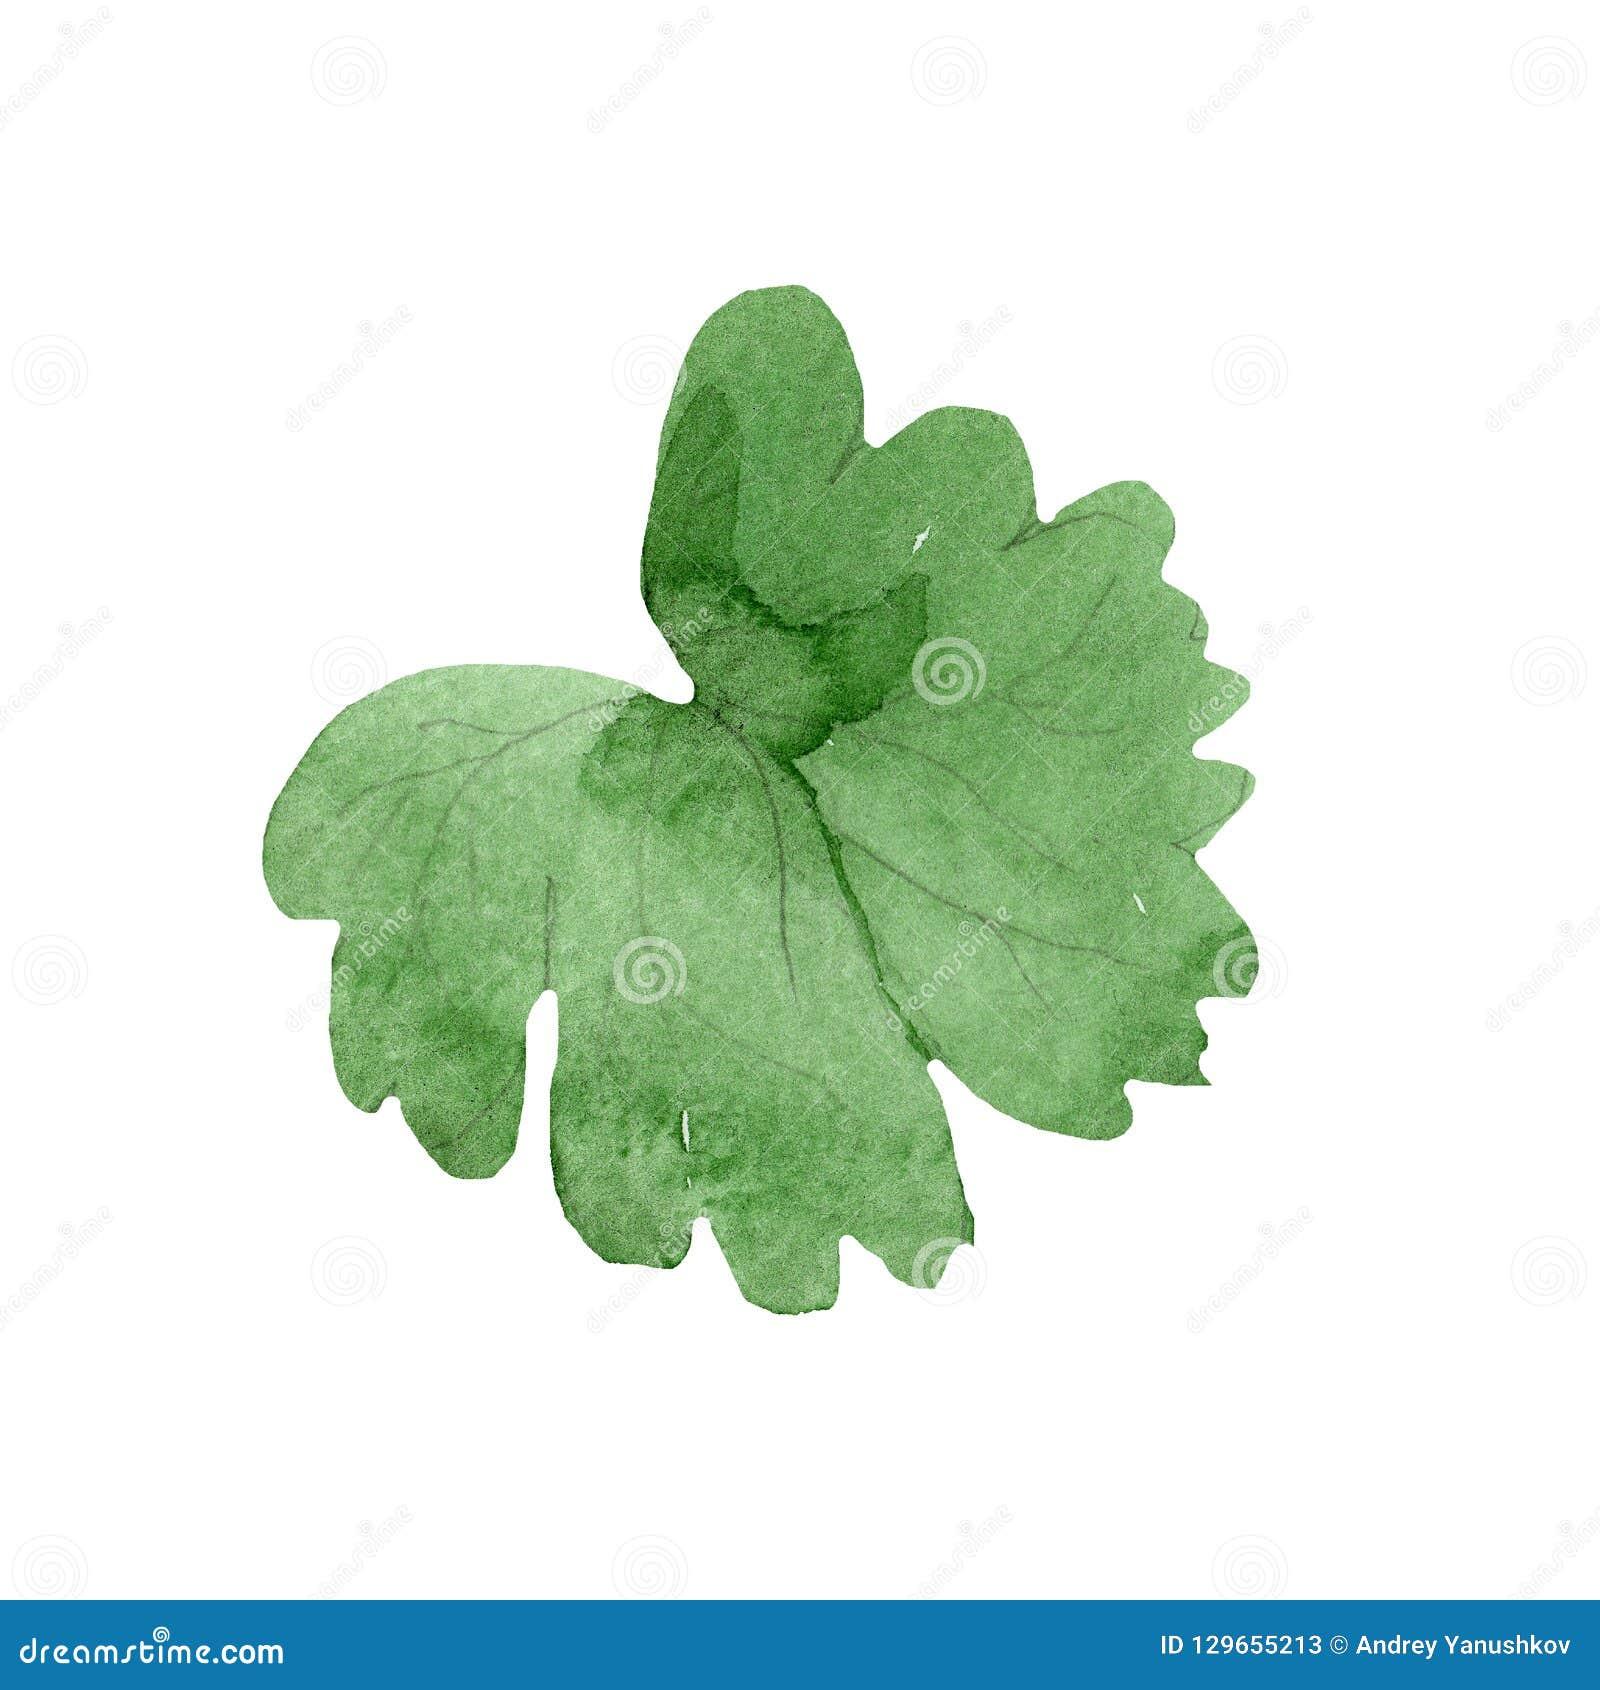 Watercolor green leaf of blue aquilegia flower. Floral botanical flower. Isolated illustration element.